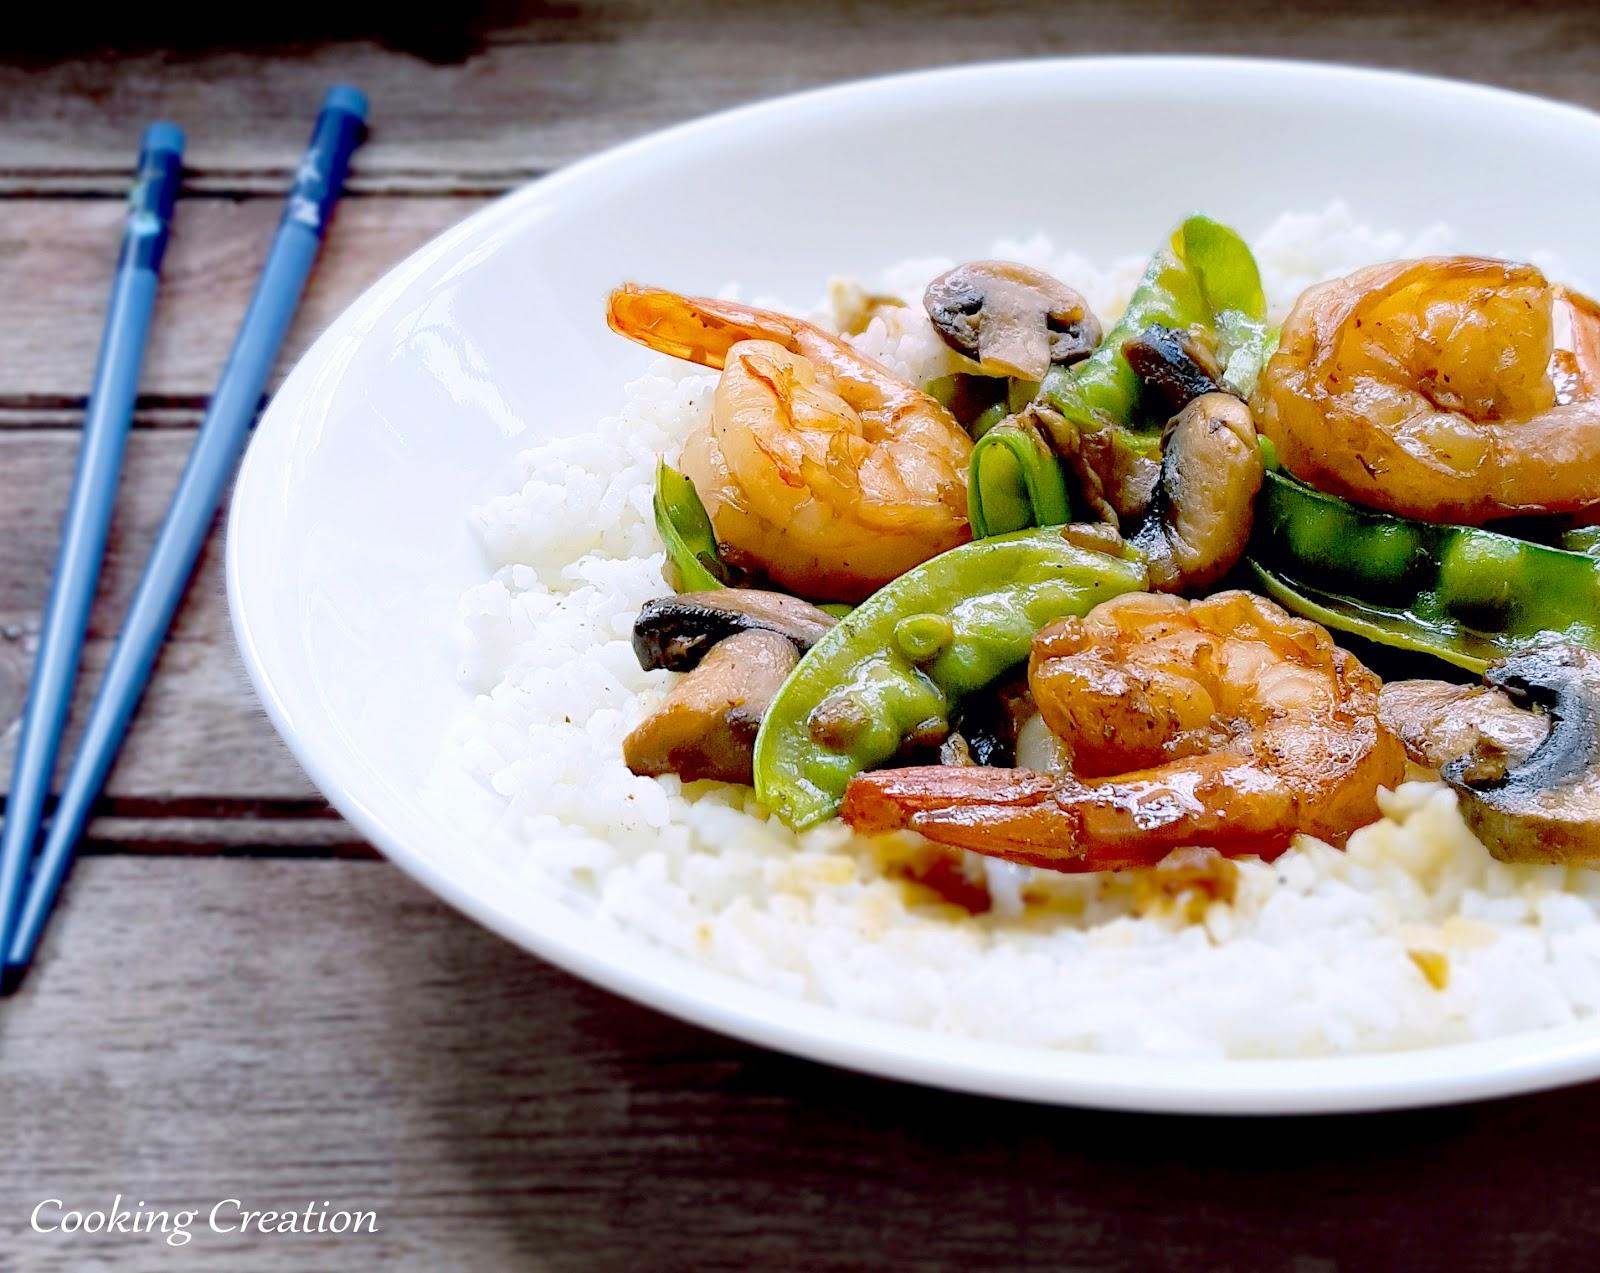 Cooking Creation: Shrimp, Snow Peas & Mushrooms over ...